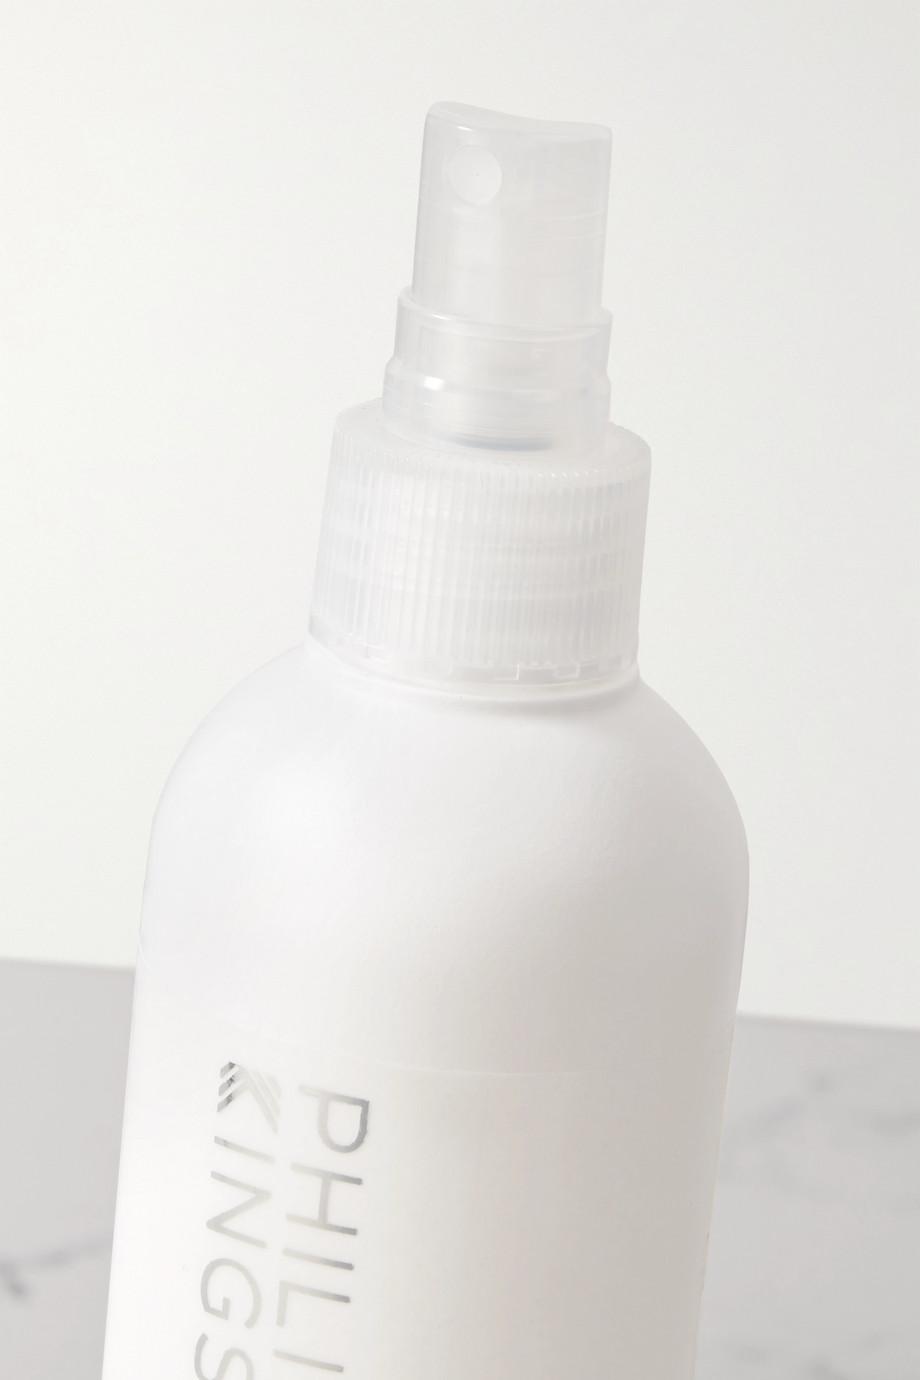 PHILIP KINGSLEY Maximizer Root Boosting Spray, 250ml